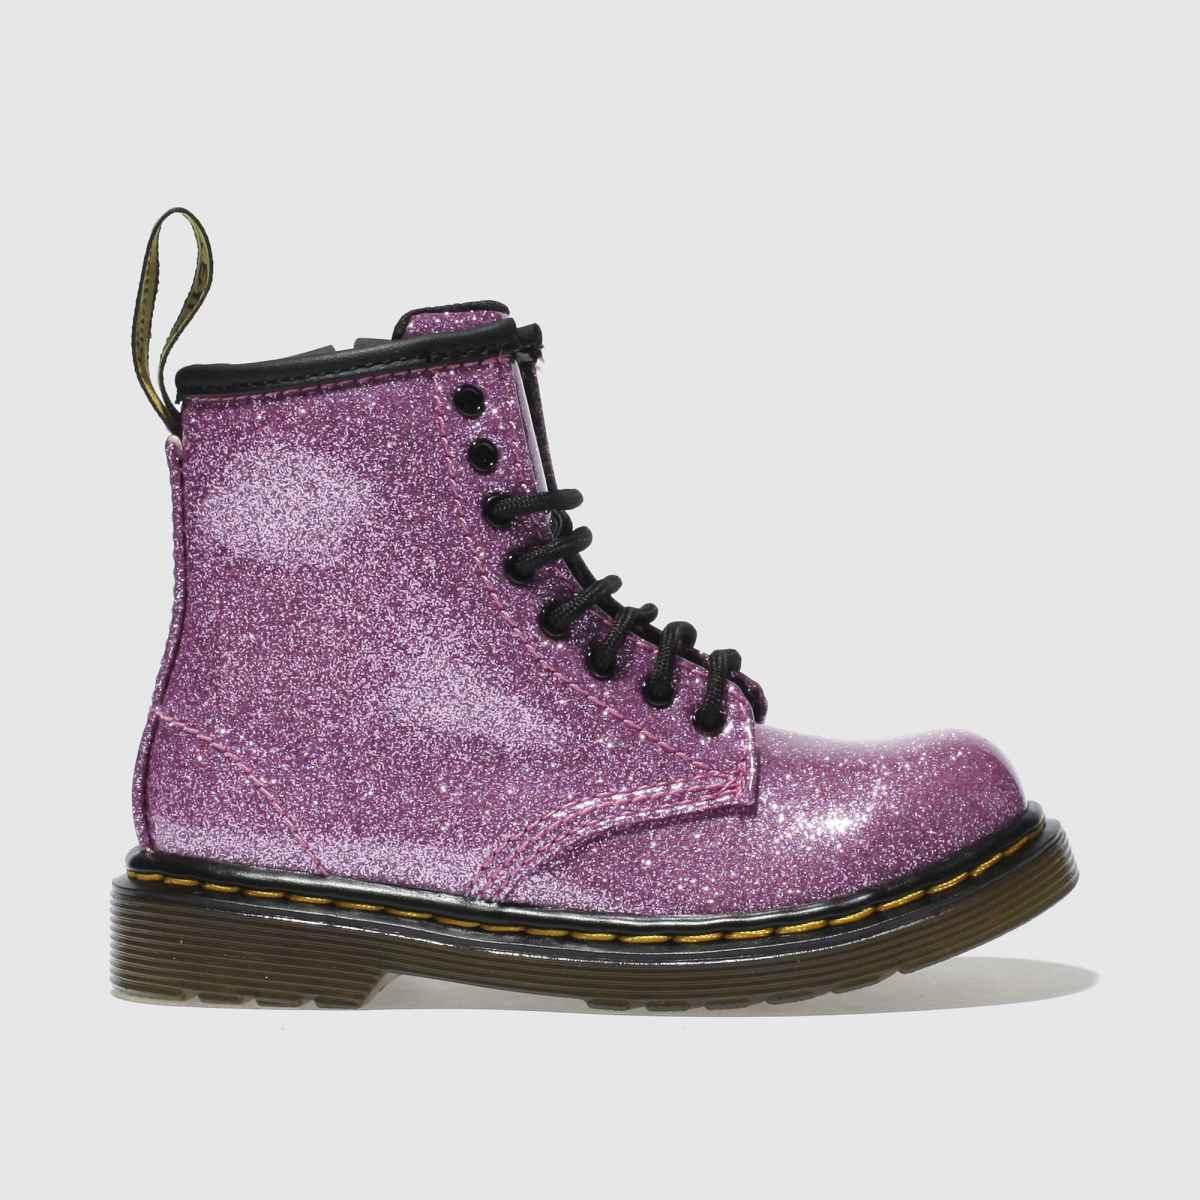 Dr Martens Pink 1460 Glitter Boots Toddler